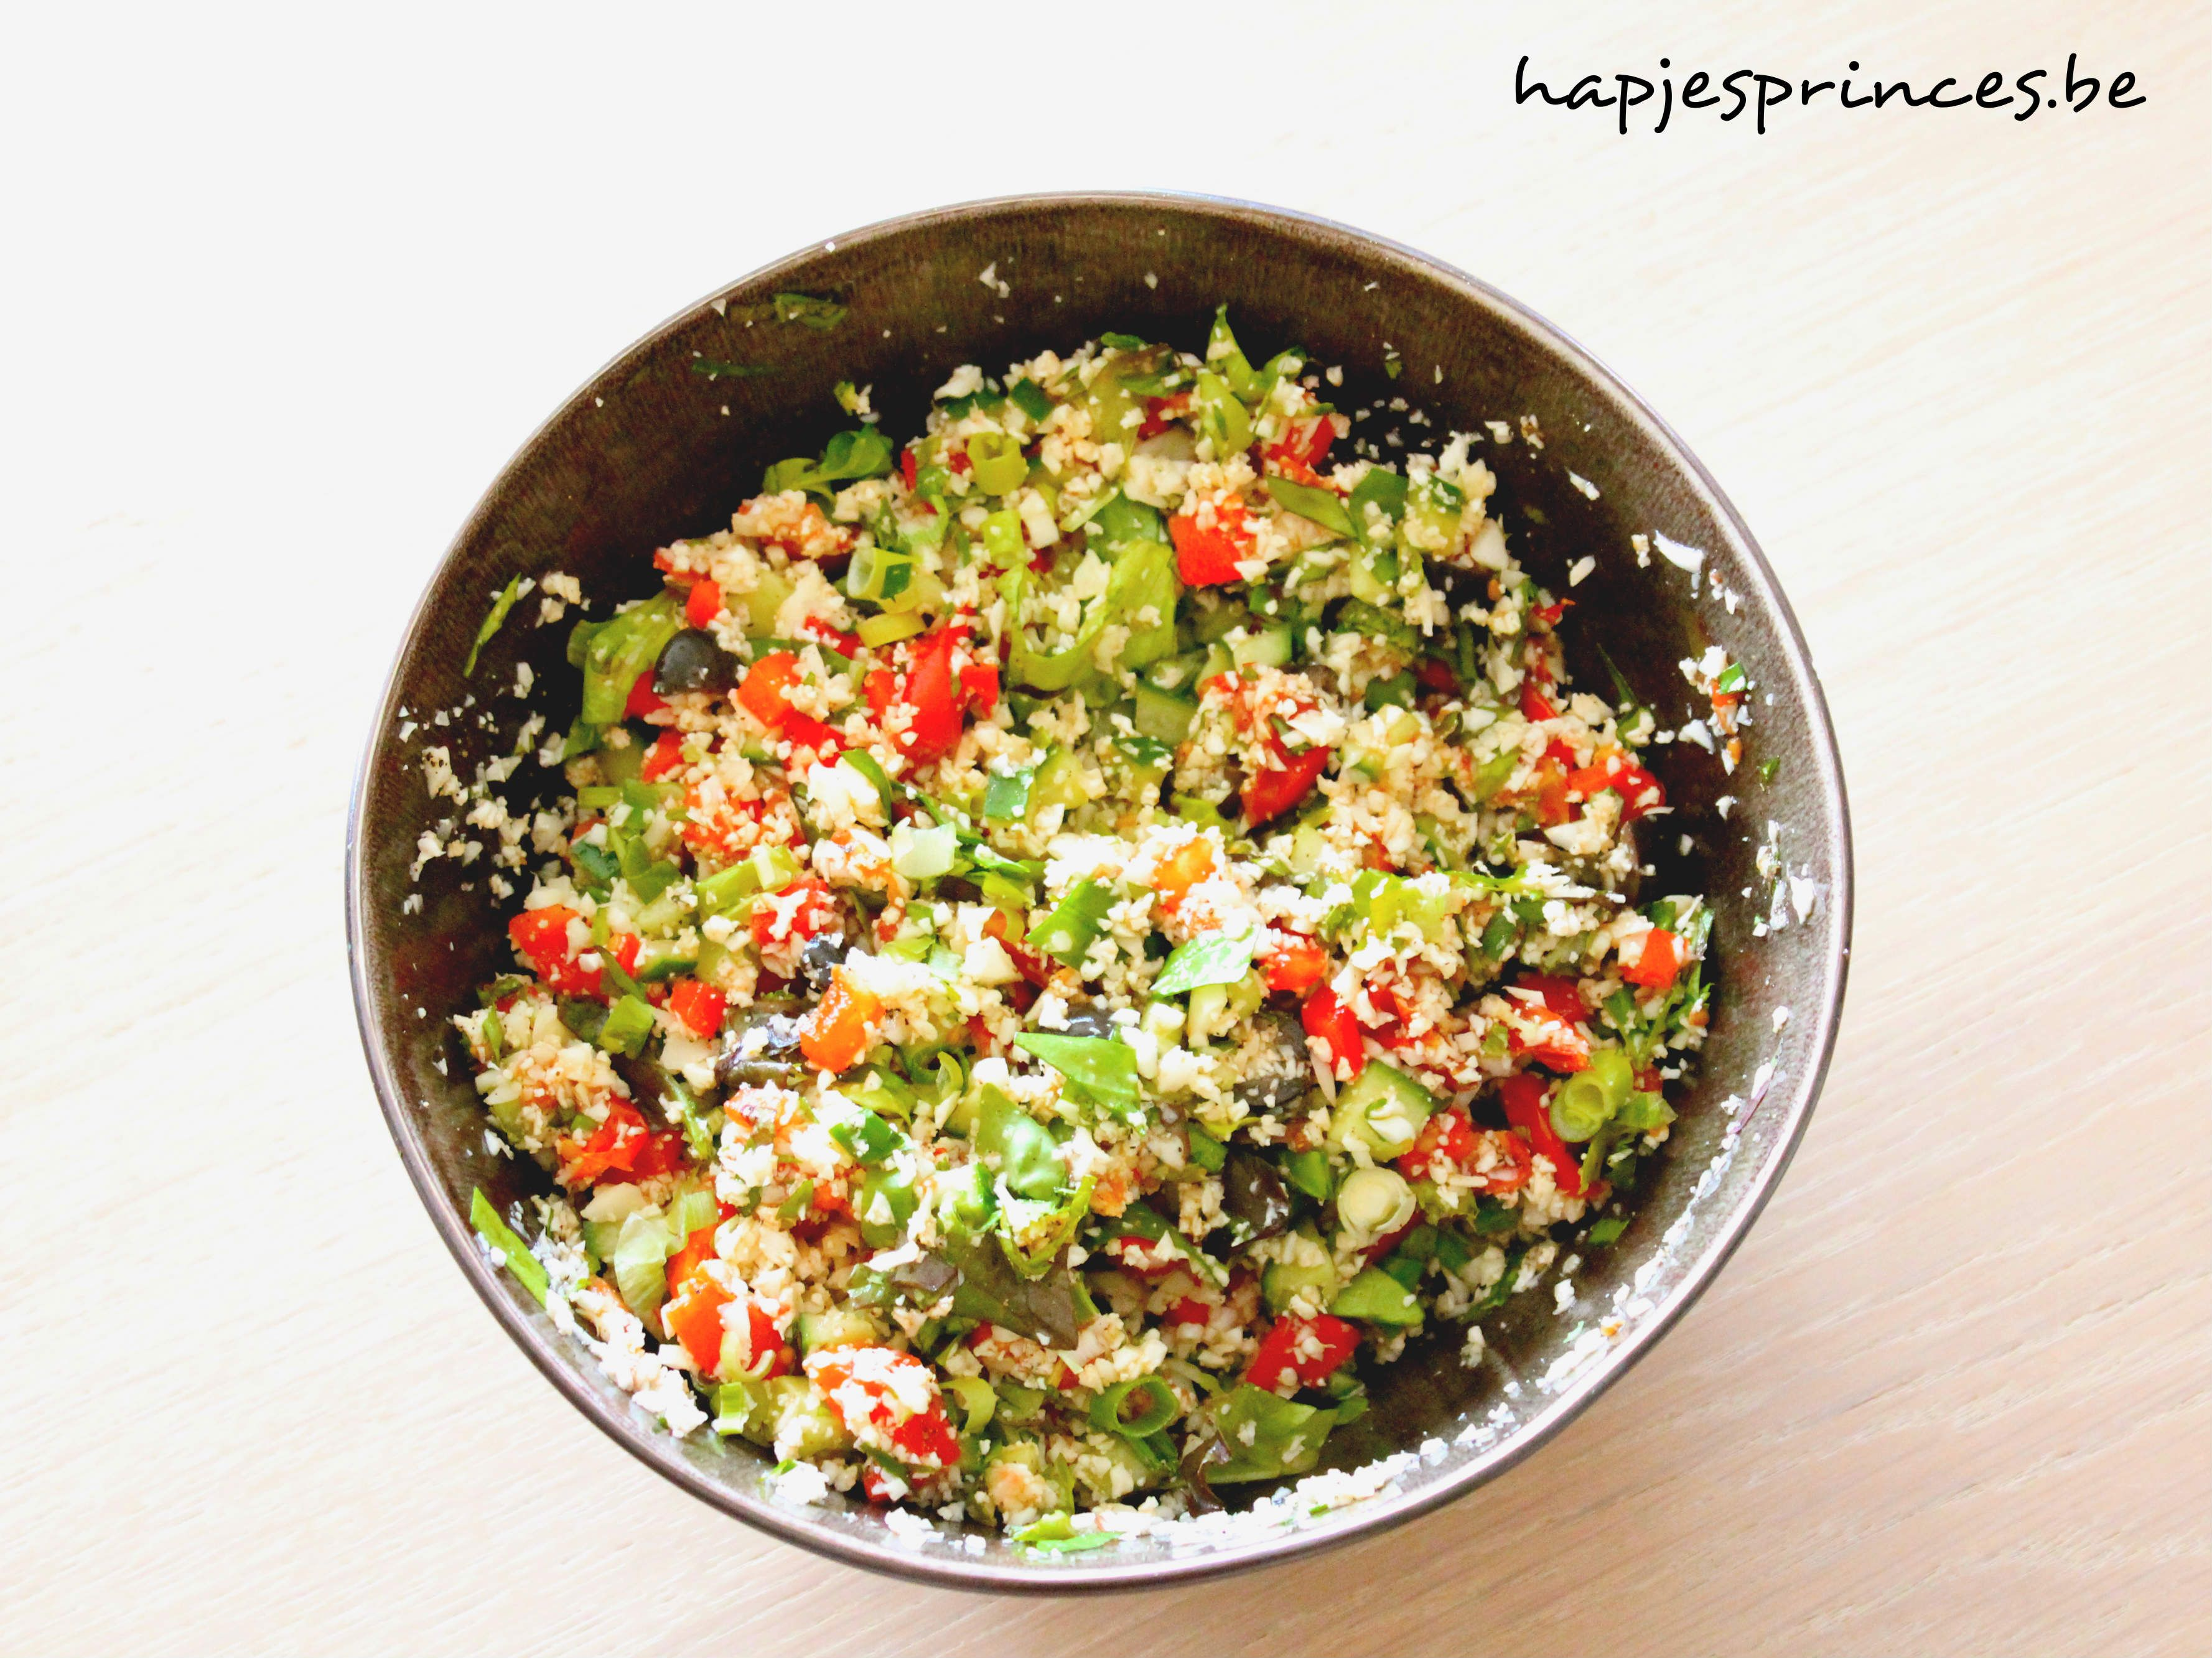 Cauliflower couscous with feta